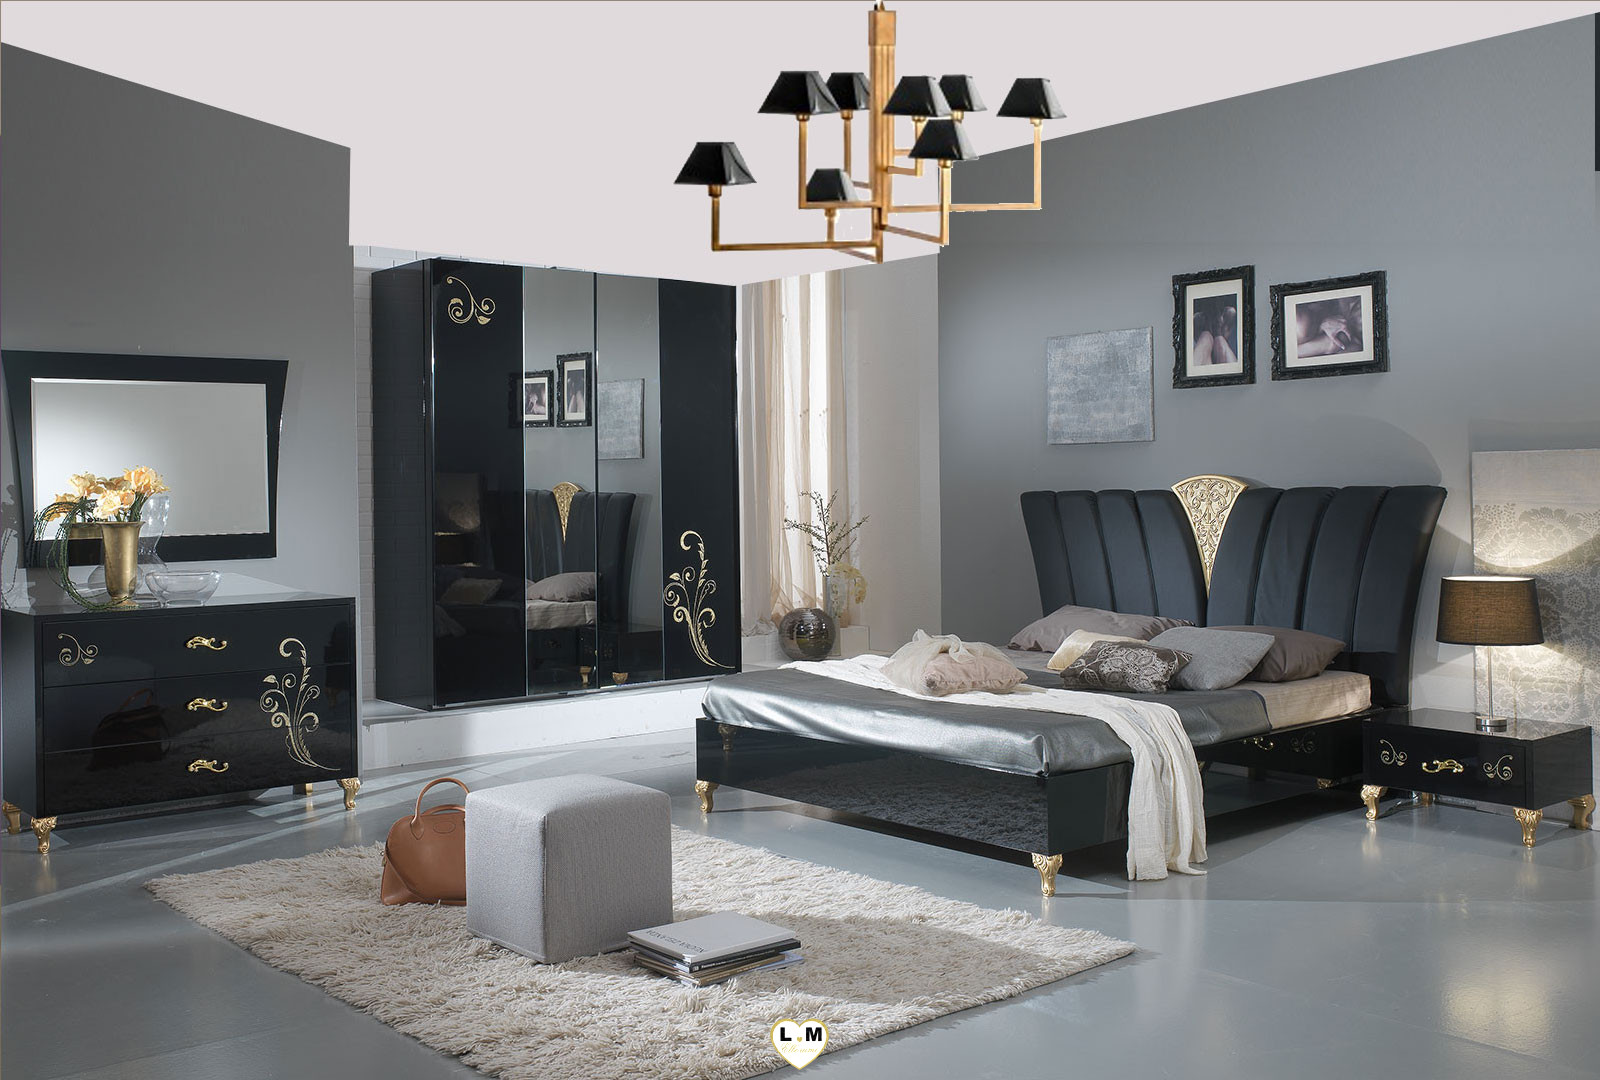 Berenice Noir Laque Chambre Dore Et A Coucher DesignL'ensemble Nvmn0w8O